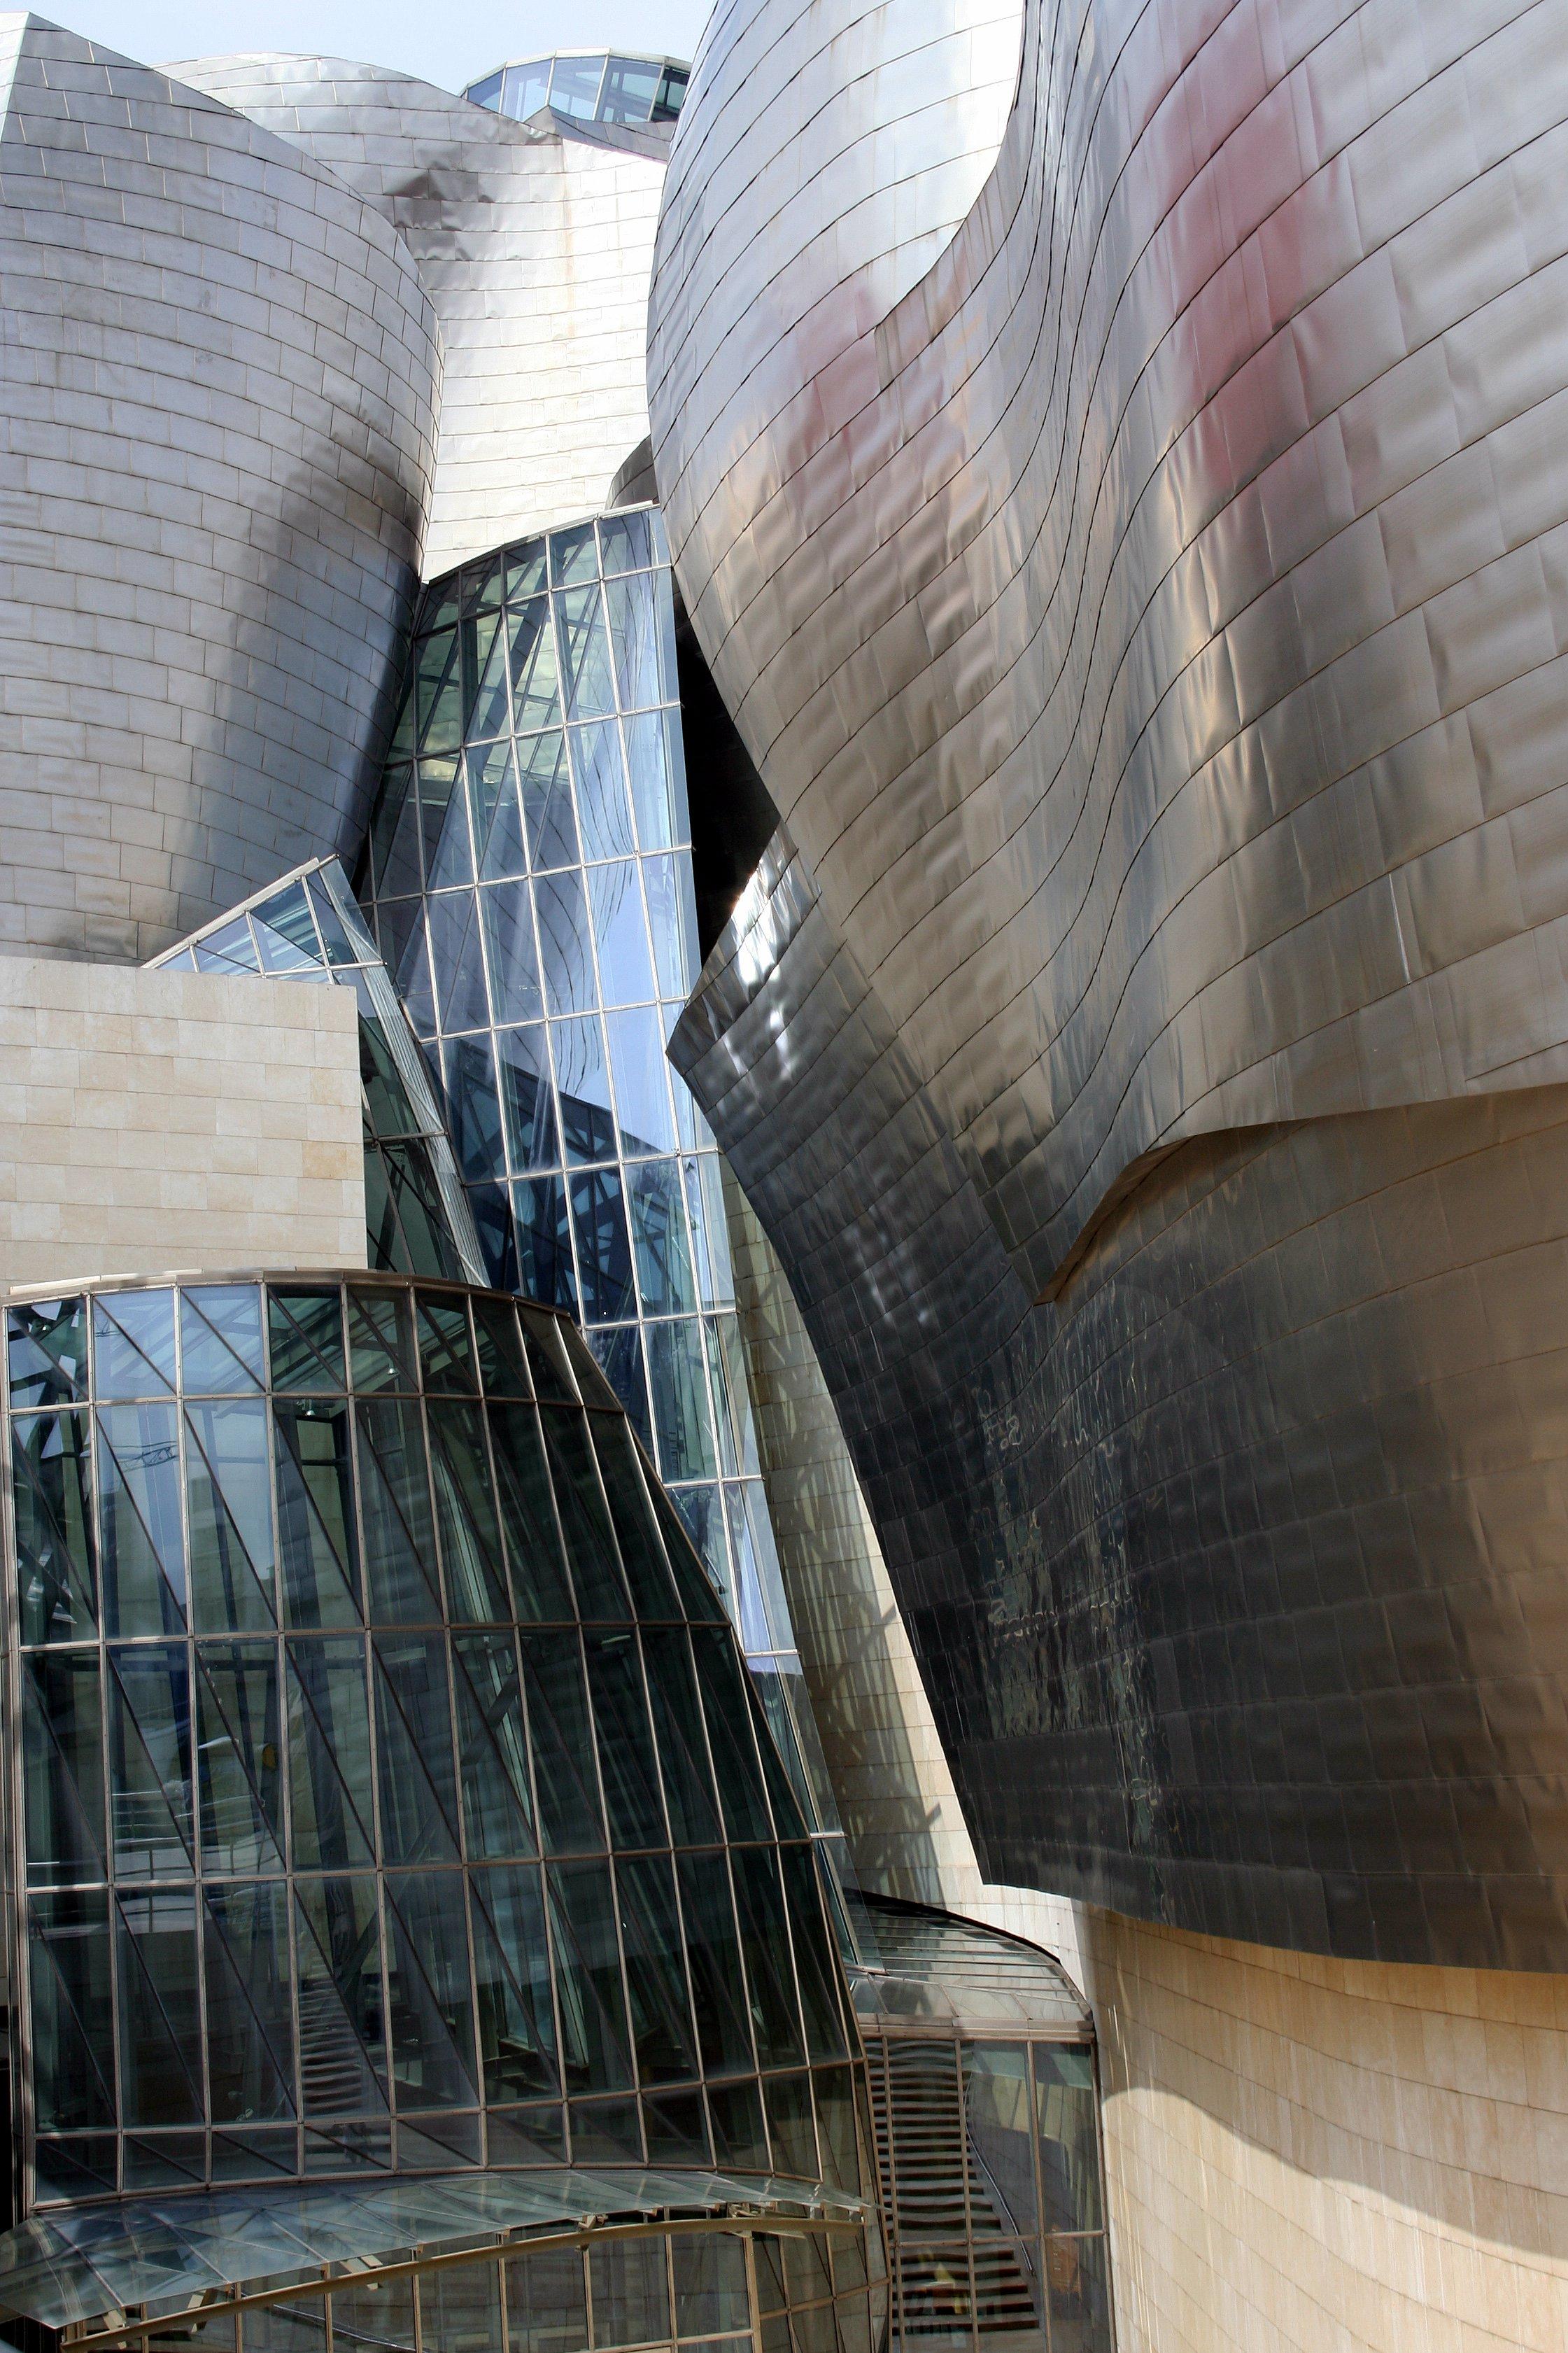 Dekonstruktivismus architektur - Dekonstruktivismus architektur ...